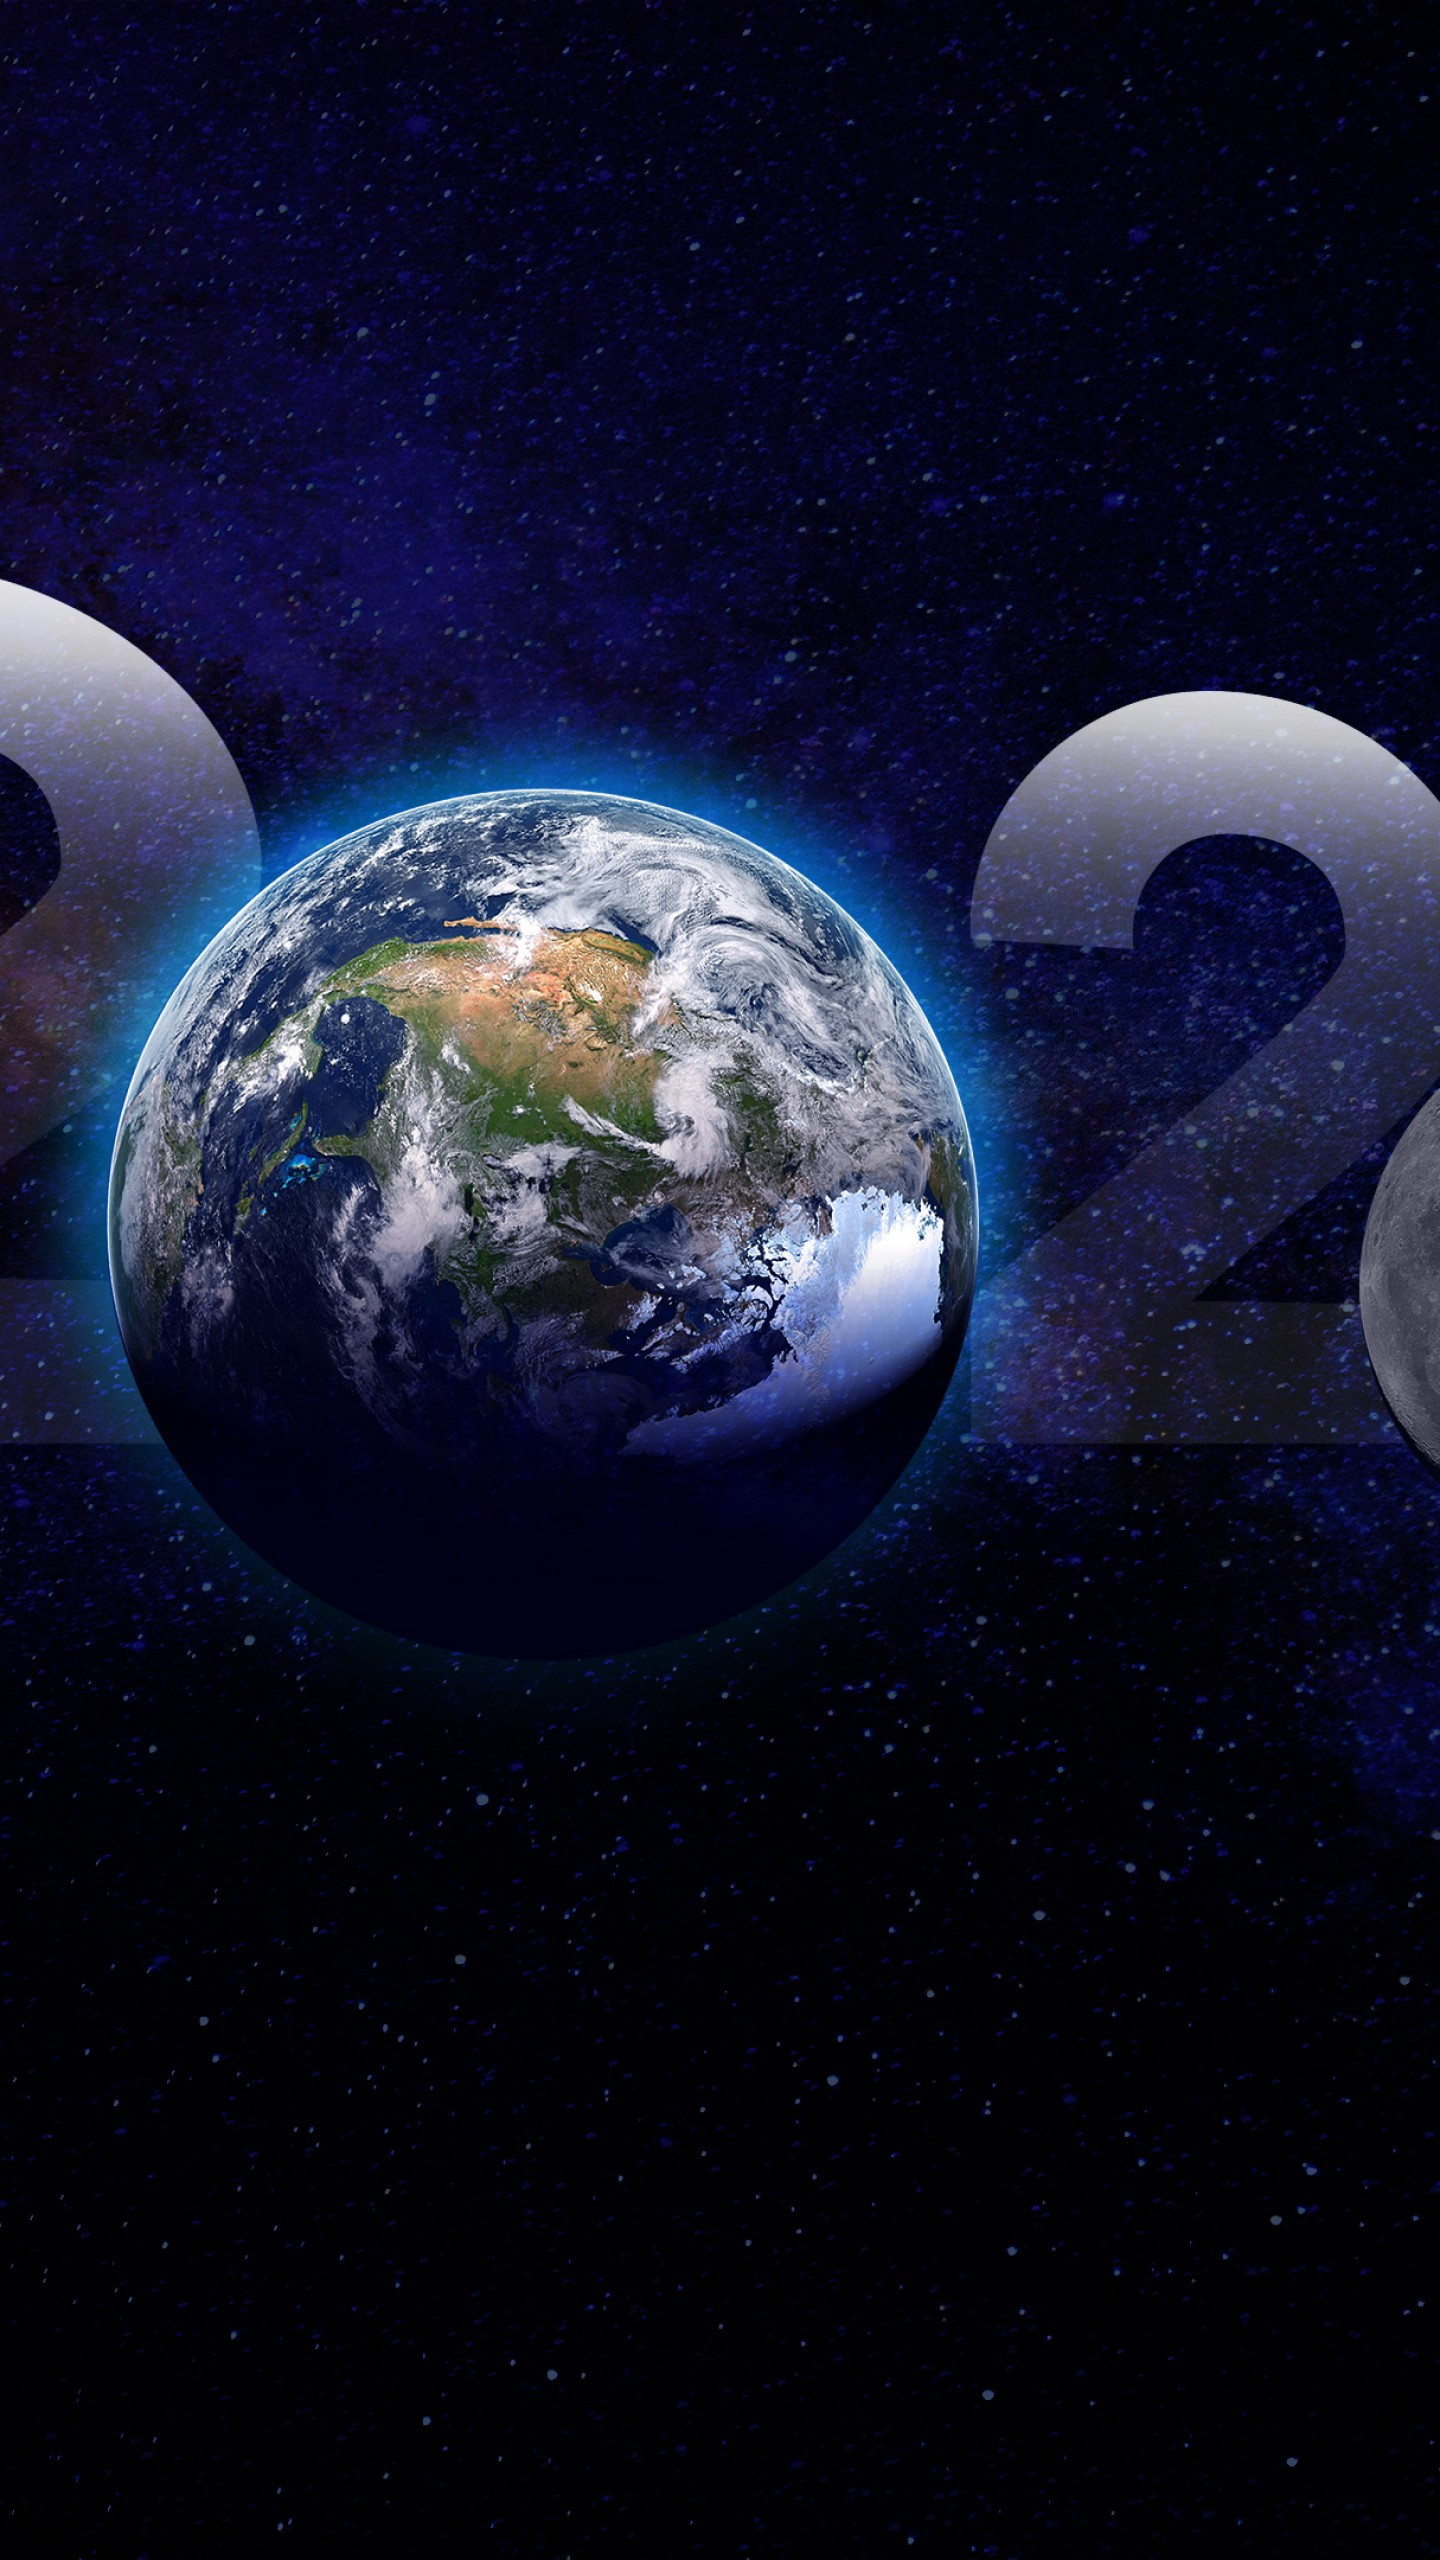 عکس زمینه کره زمین و سال 2020 میلادی پس زمینه